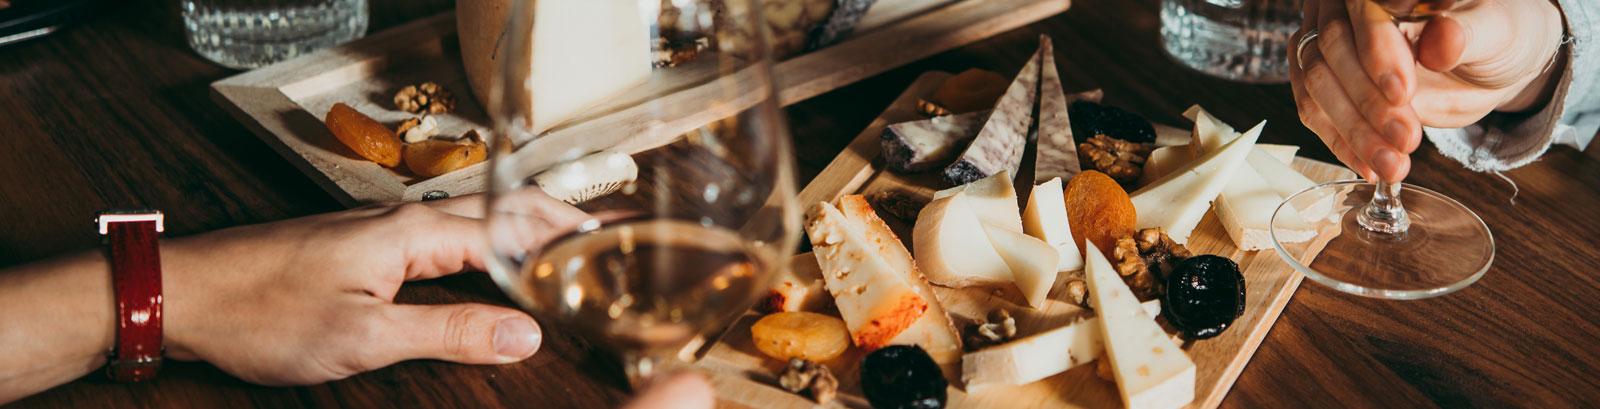 Rythm and Booze - wine and tapas lounge bar